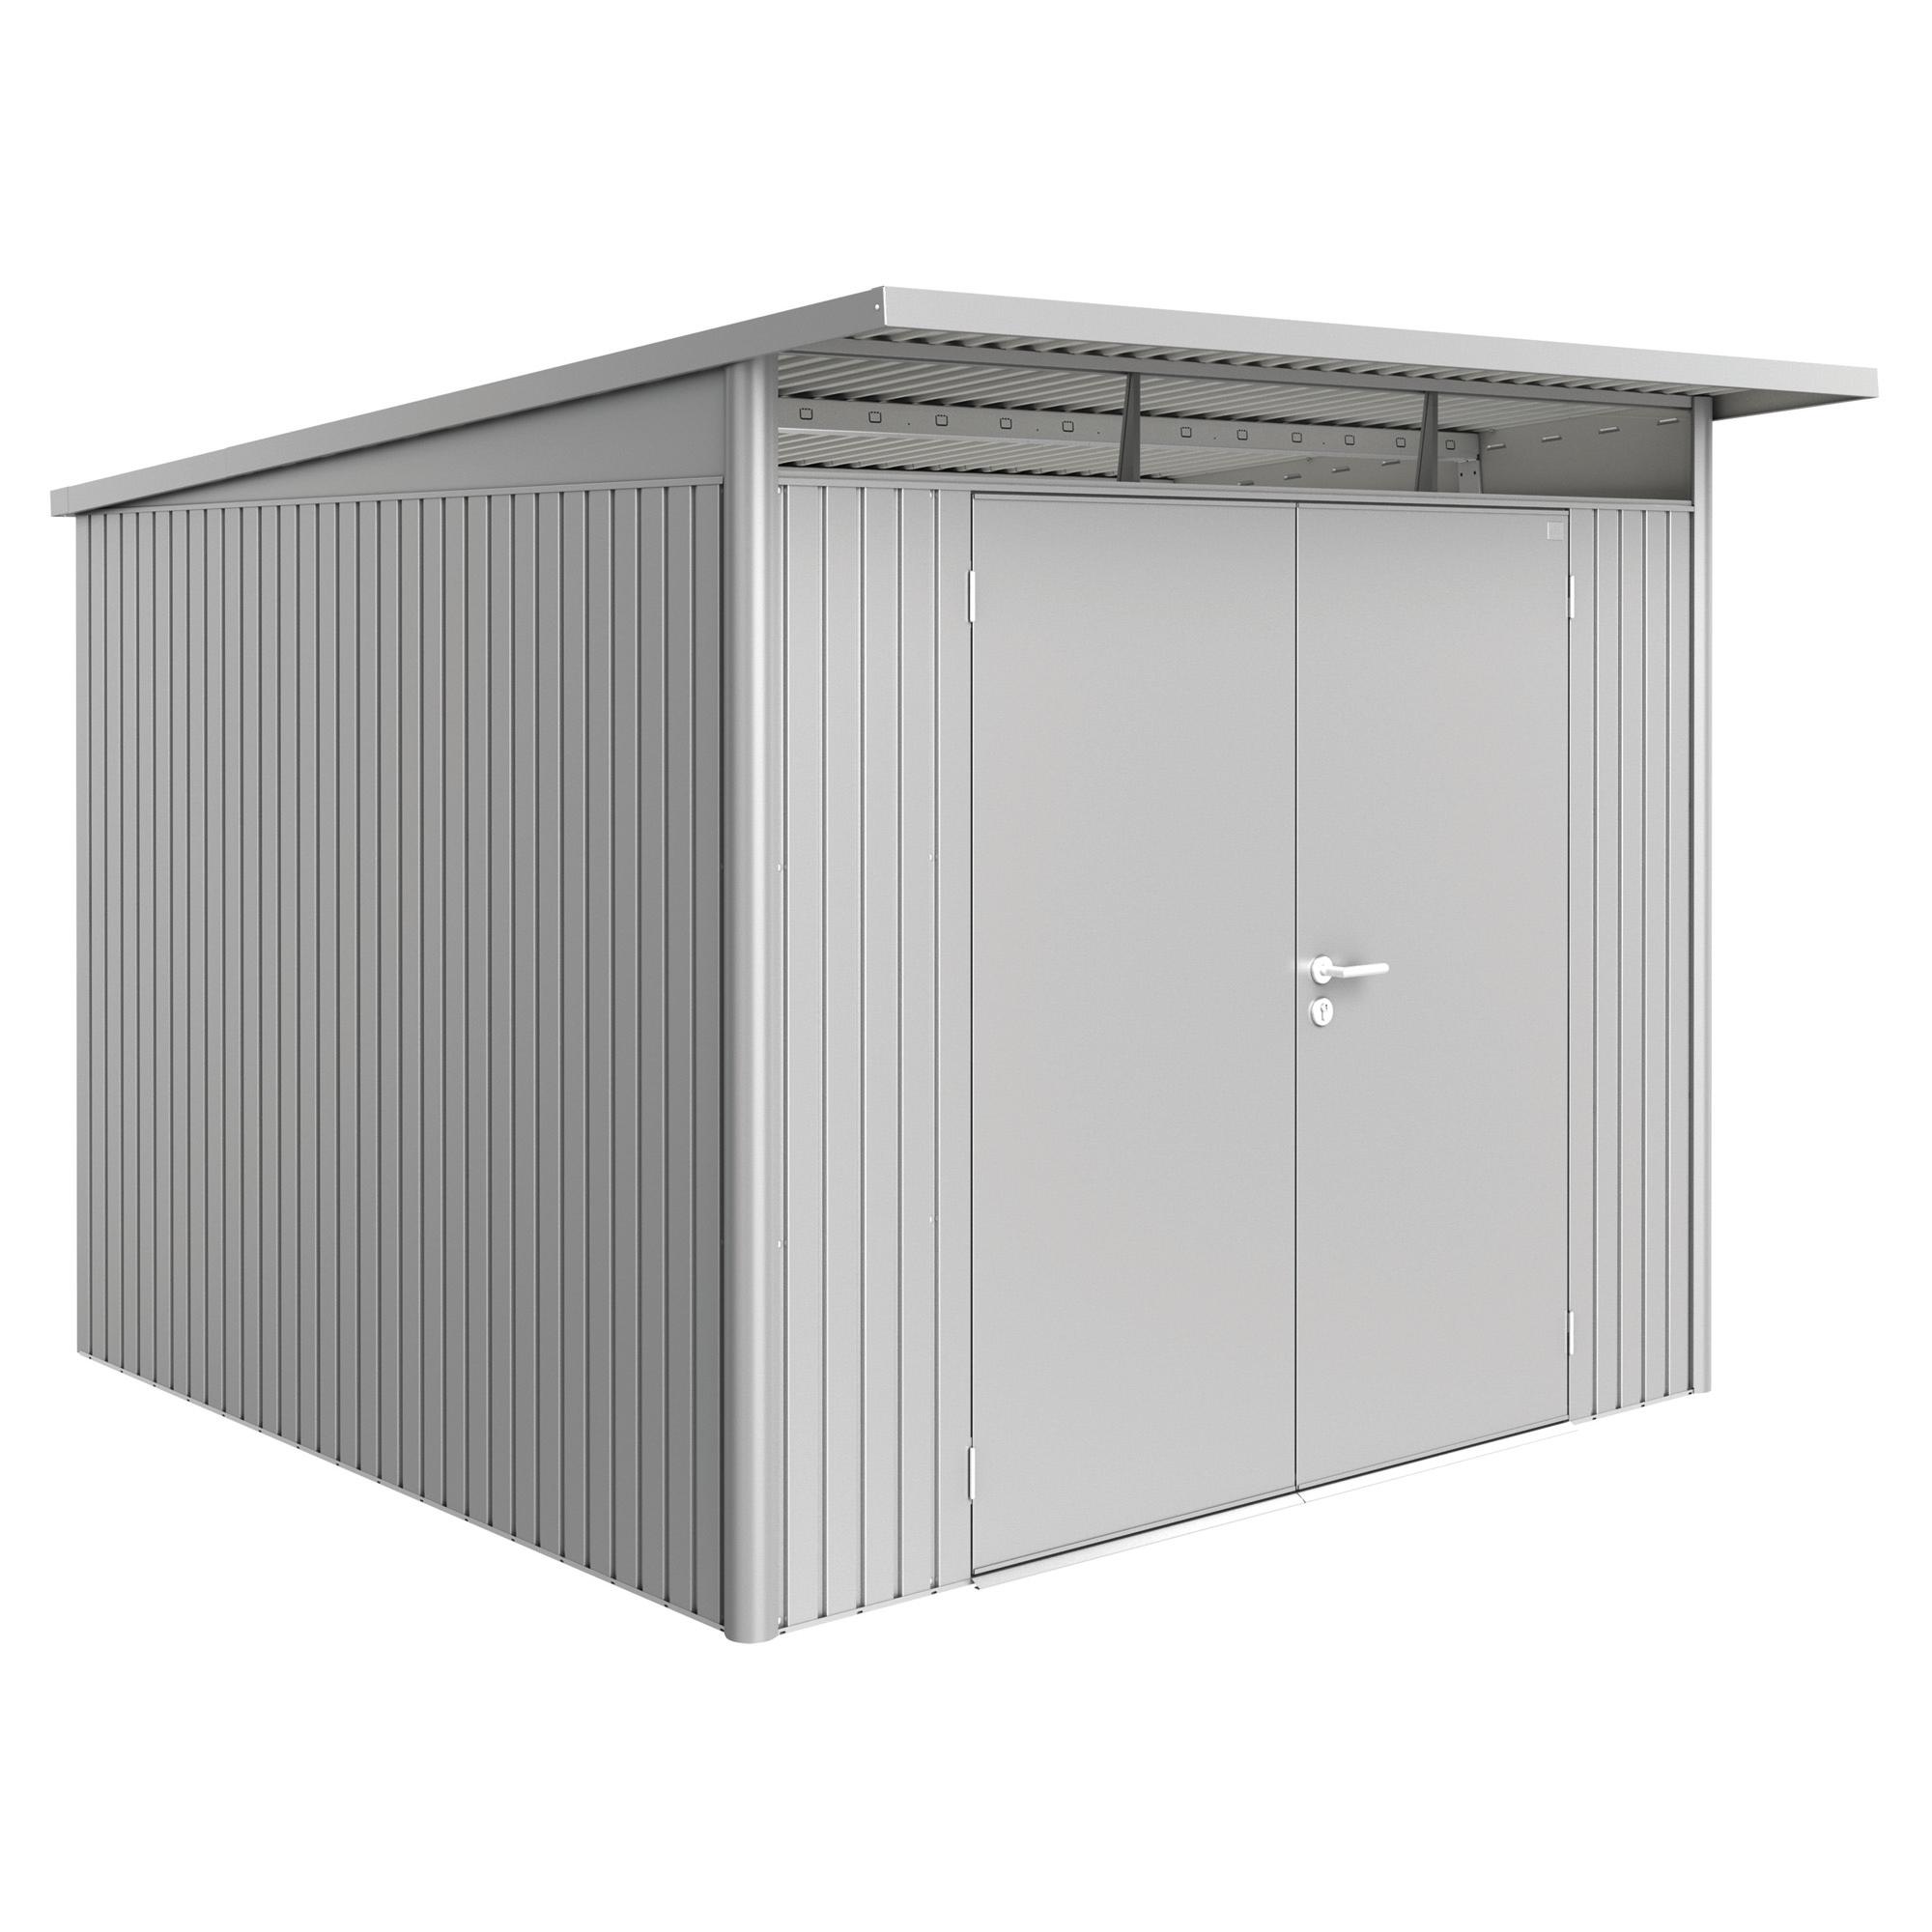 Biohort Gerätehaus 'AvantGarde XL' 260 x 300 cm Silber ...